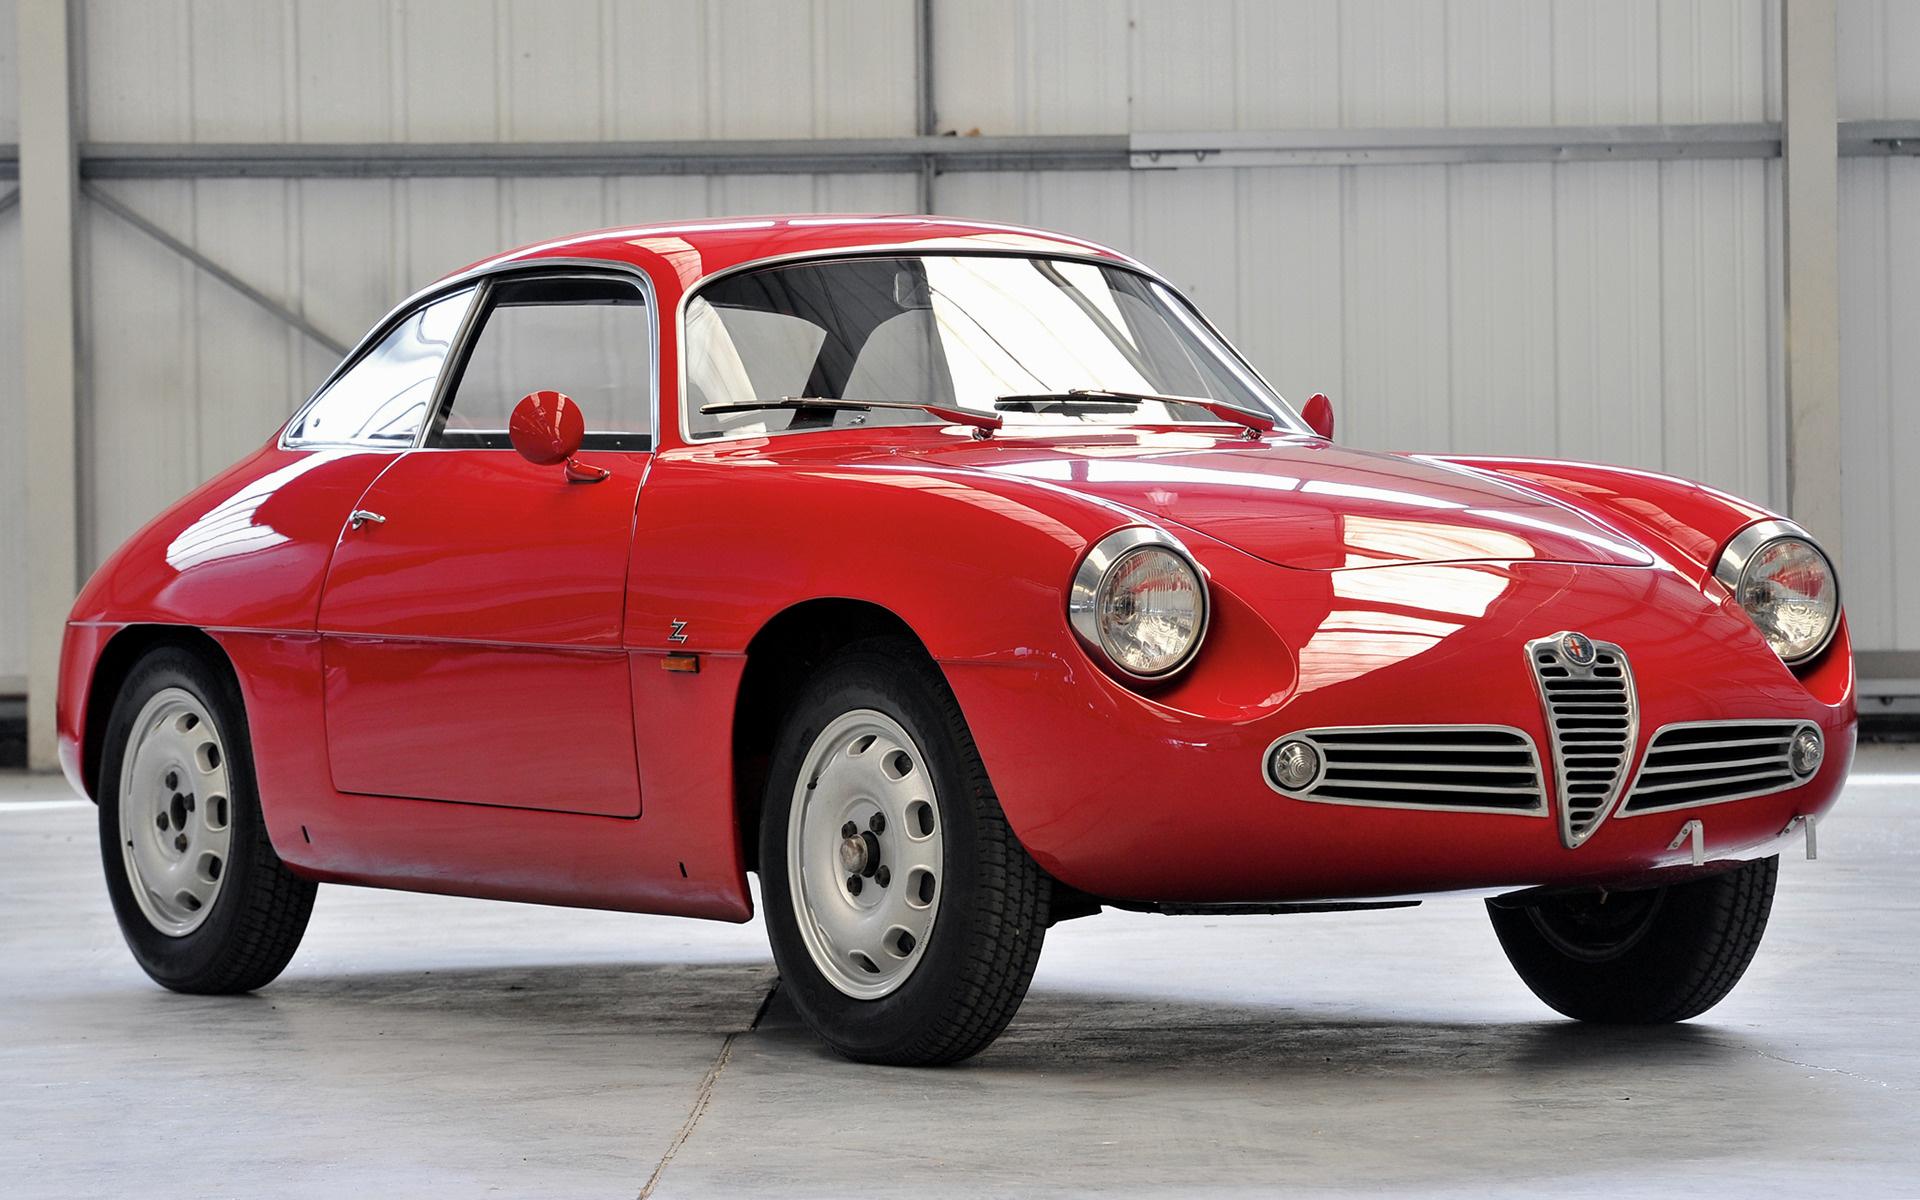 1960 Alfa Romeo Giulietta Sz Wallpapers And Hd Images